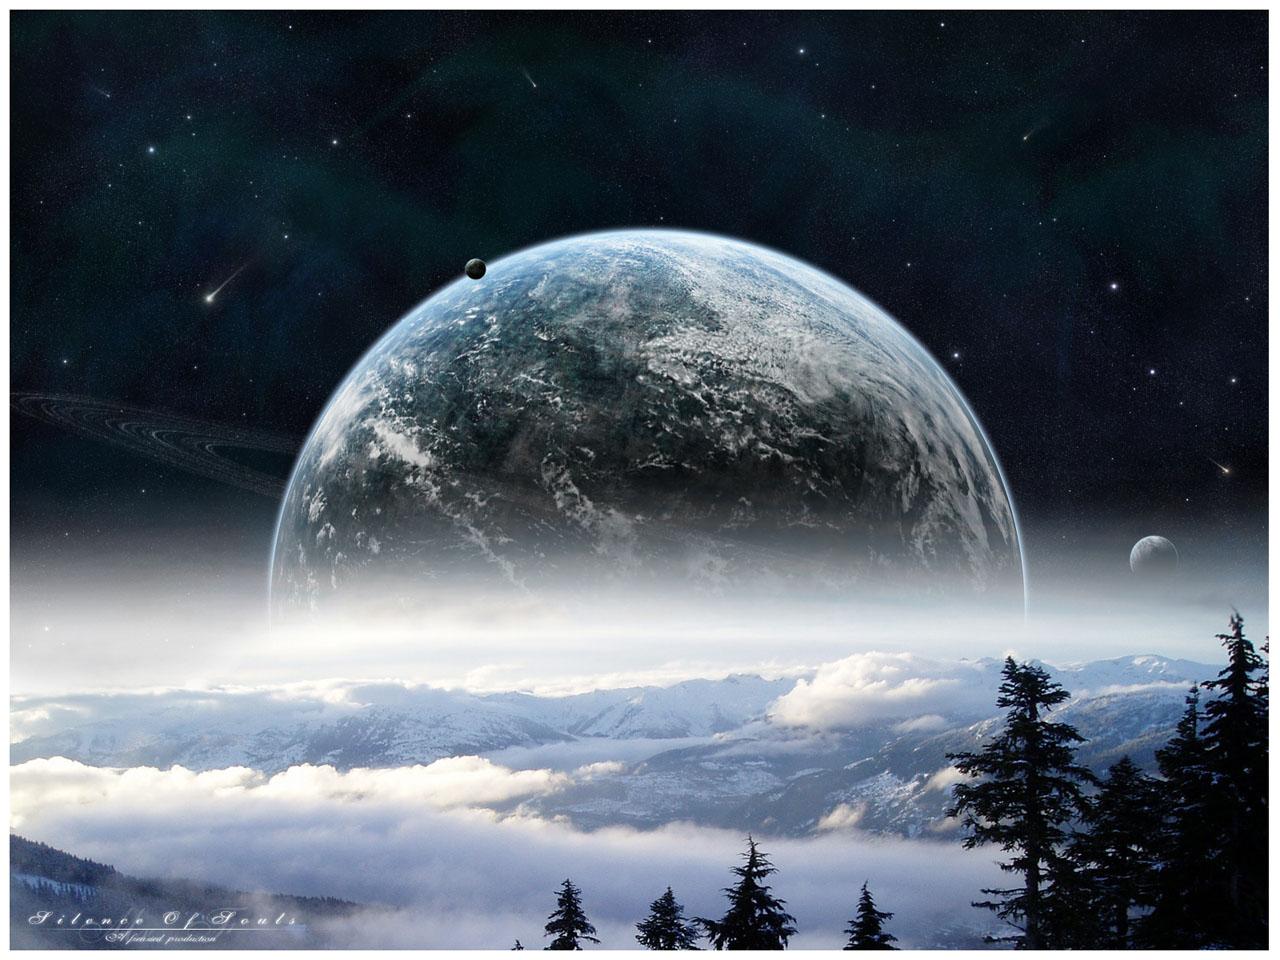 宇宙科幻空間 宇宙科幻空間 | Android桌布客棧 | 453 Android 桌布客棧 其